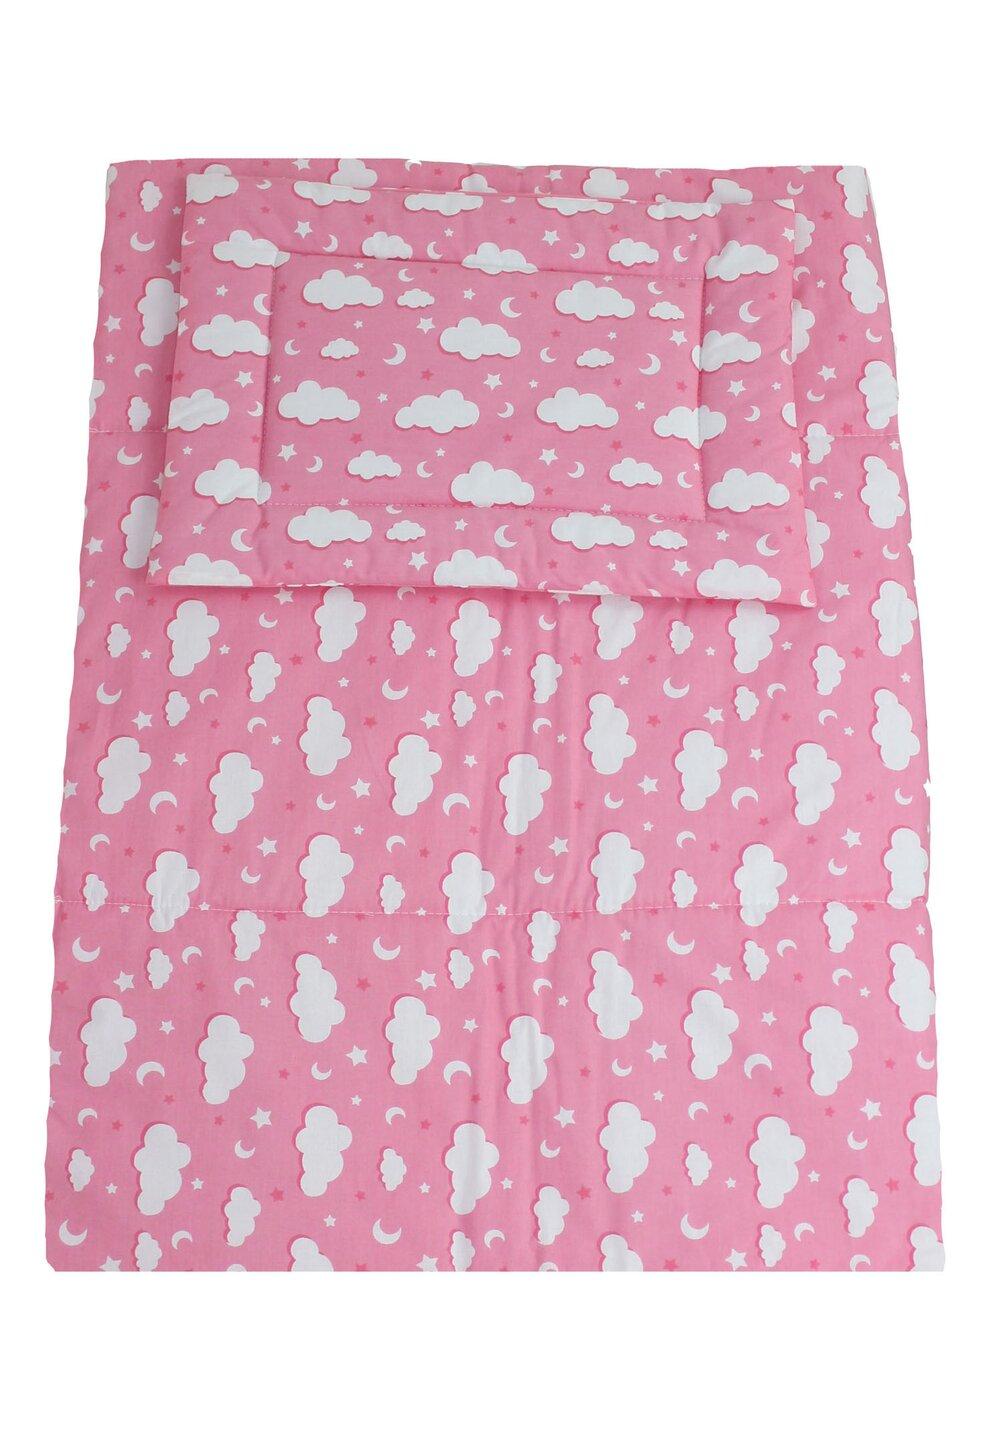 Lenjerie 3 piese, norisori si stelute, roz, 120x60cm imagine